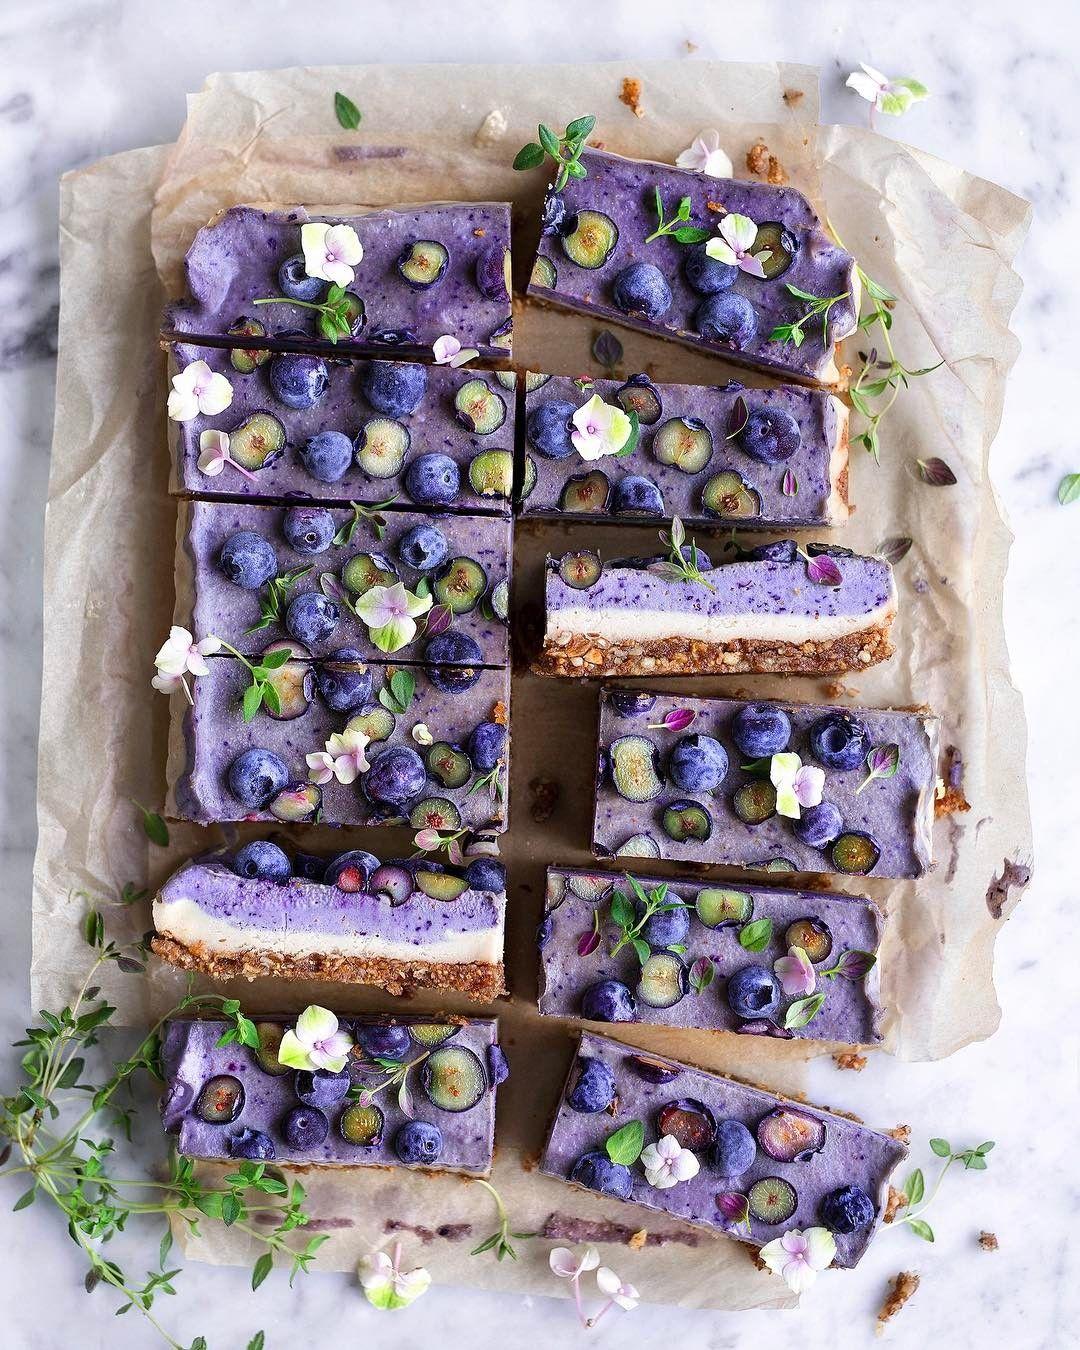 Virpi Mikkonen Vanelja Vanelja On Instagram Creamy Dream Blueberry Thyme Raw Cake Mixing Berries Fresh Herbs Makes Wo Raw Cake Raw Cheesecake Food